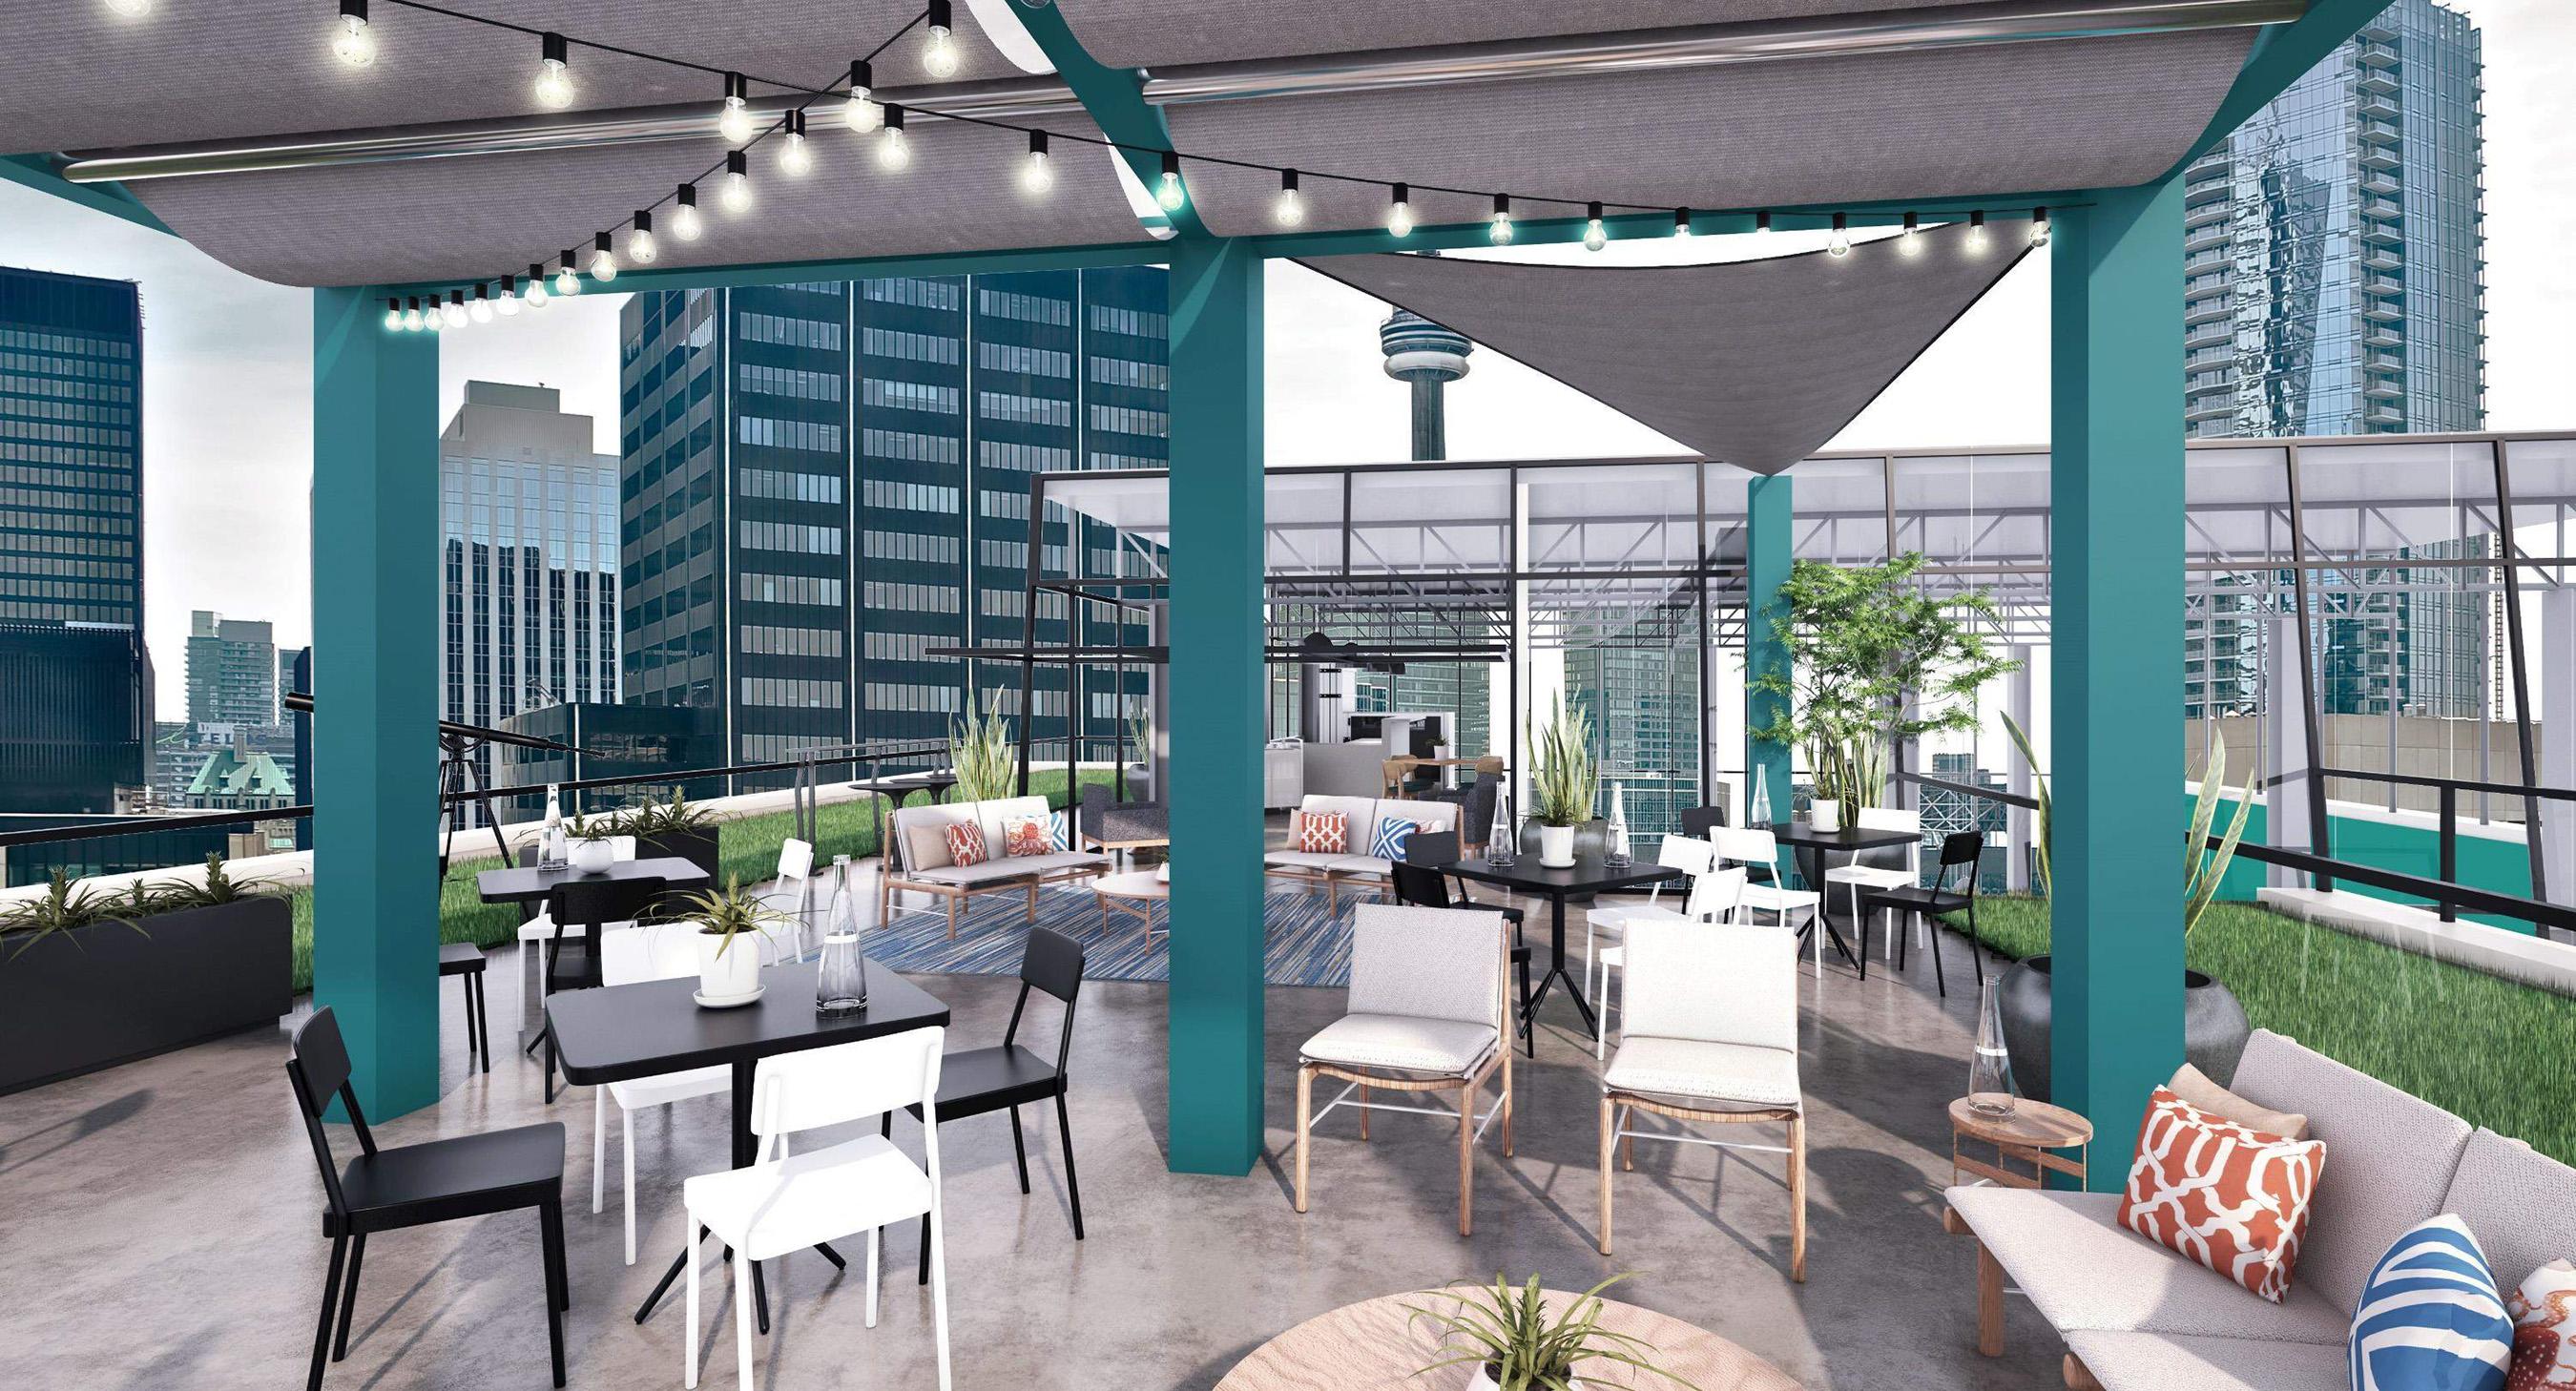 Amsterdam born creative workspace spaces comes to canada